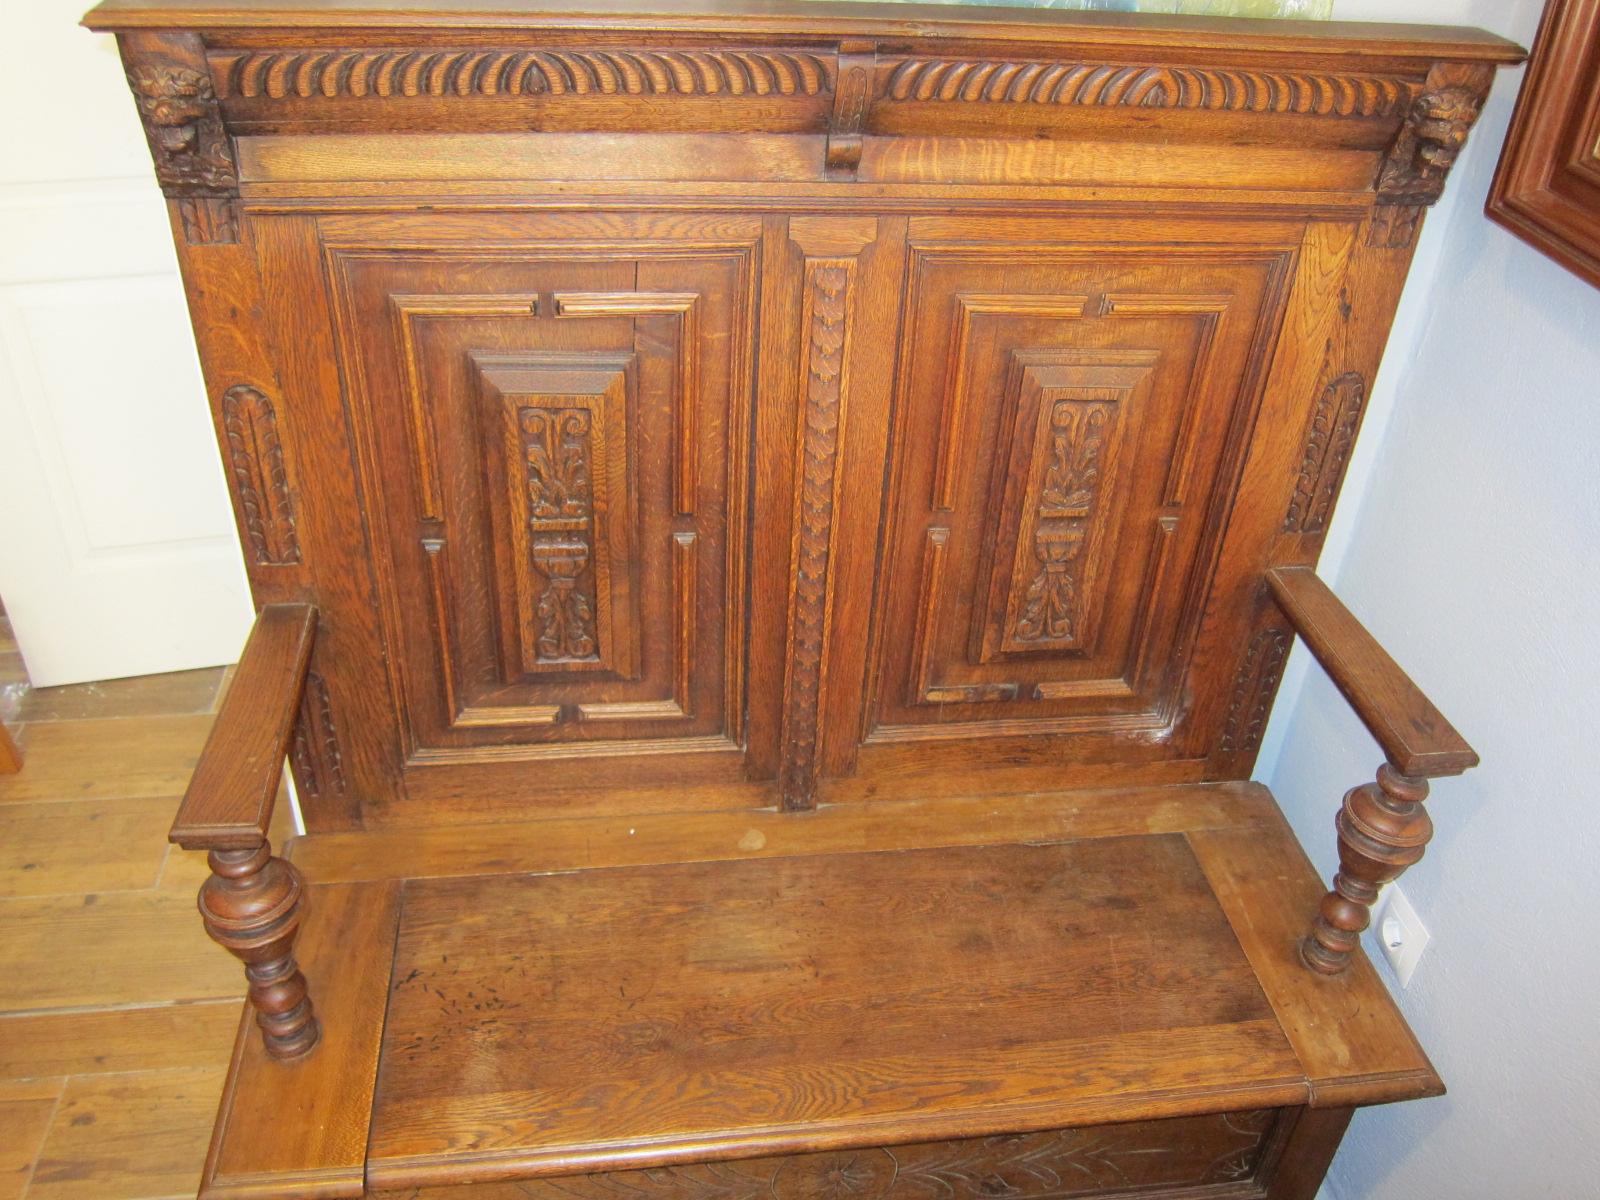 Banco arc n de iglesia original la tienda del ruso for Banco arcon madera